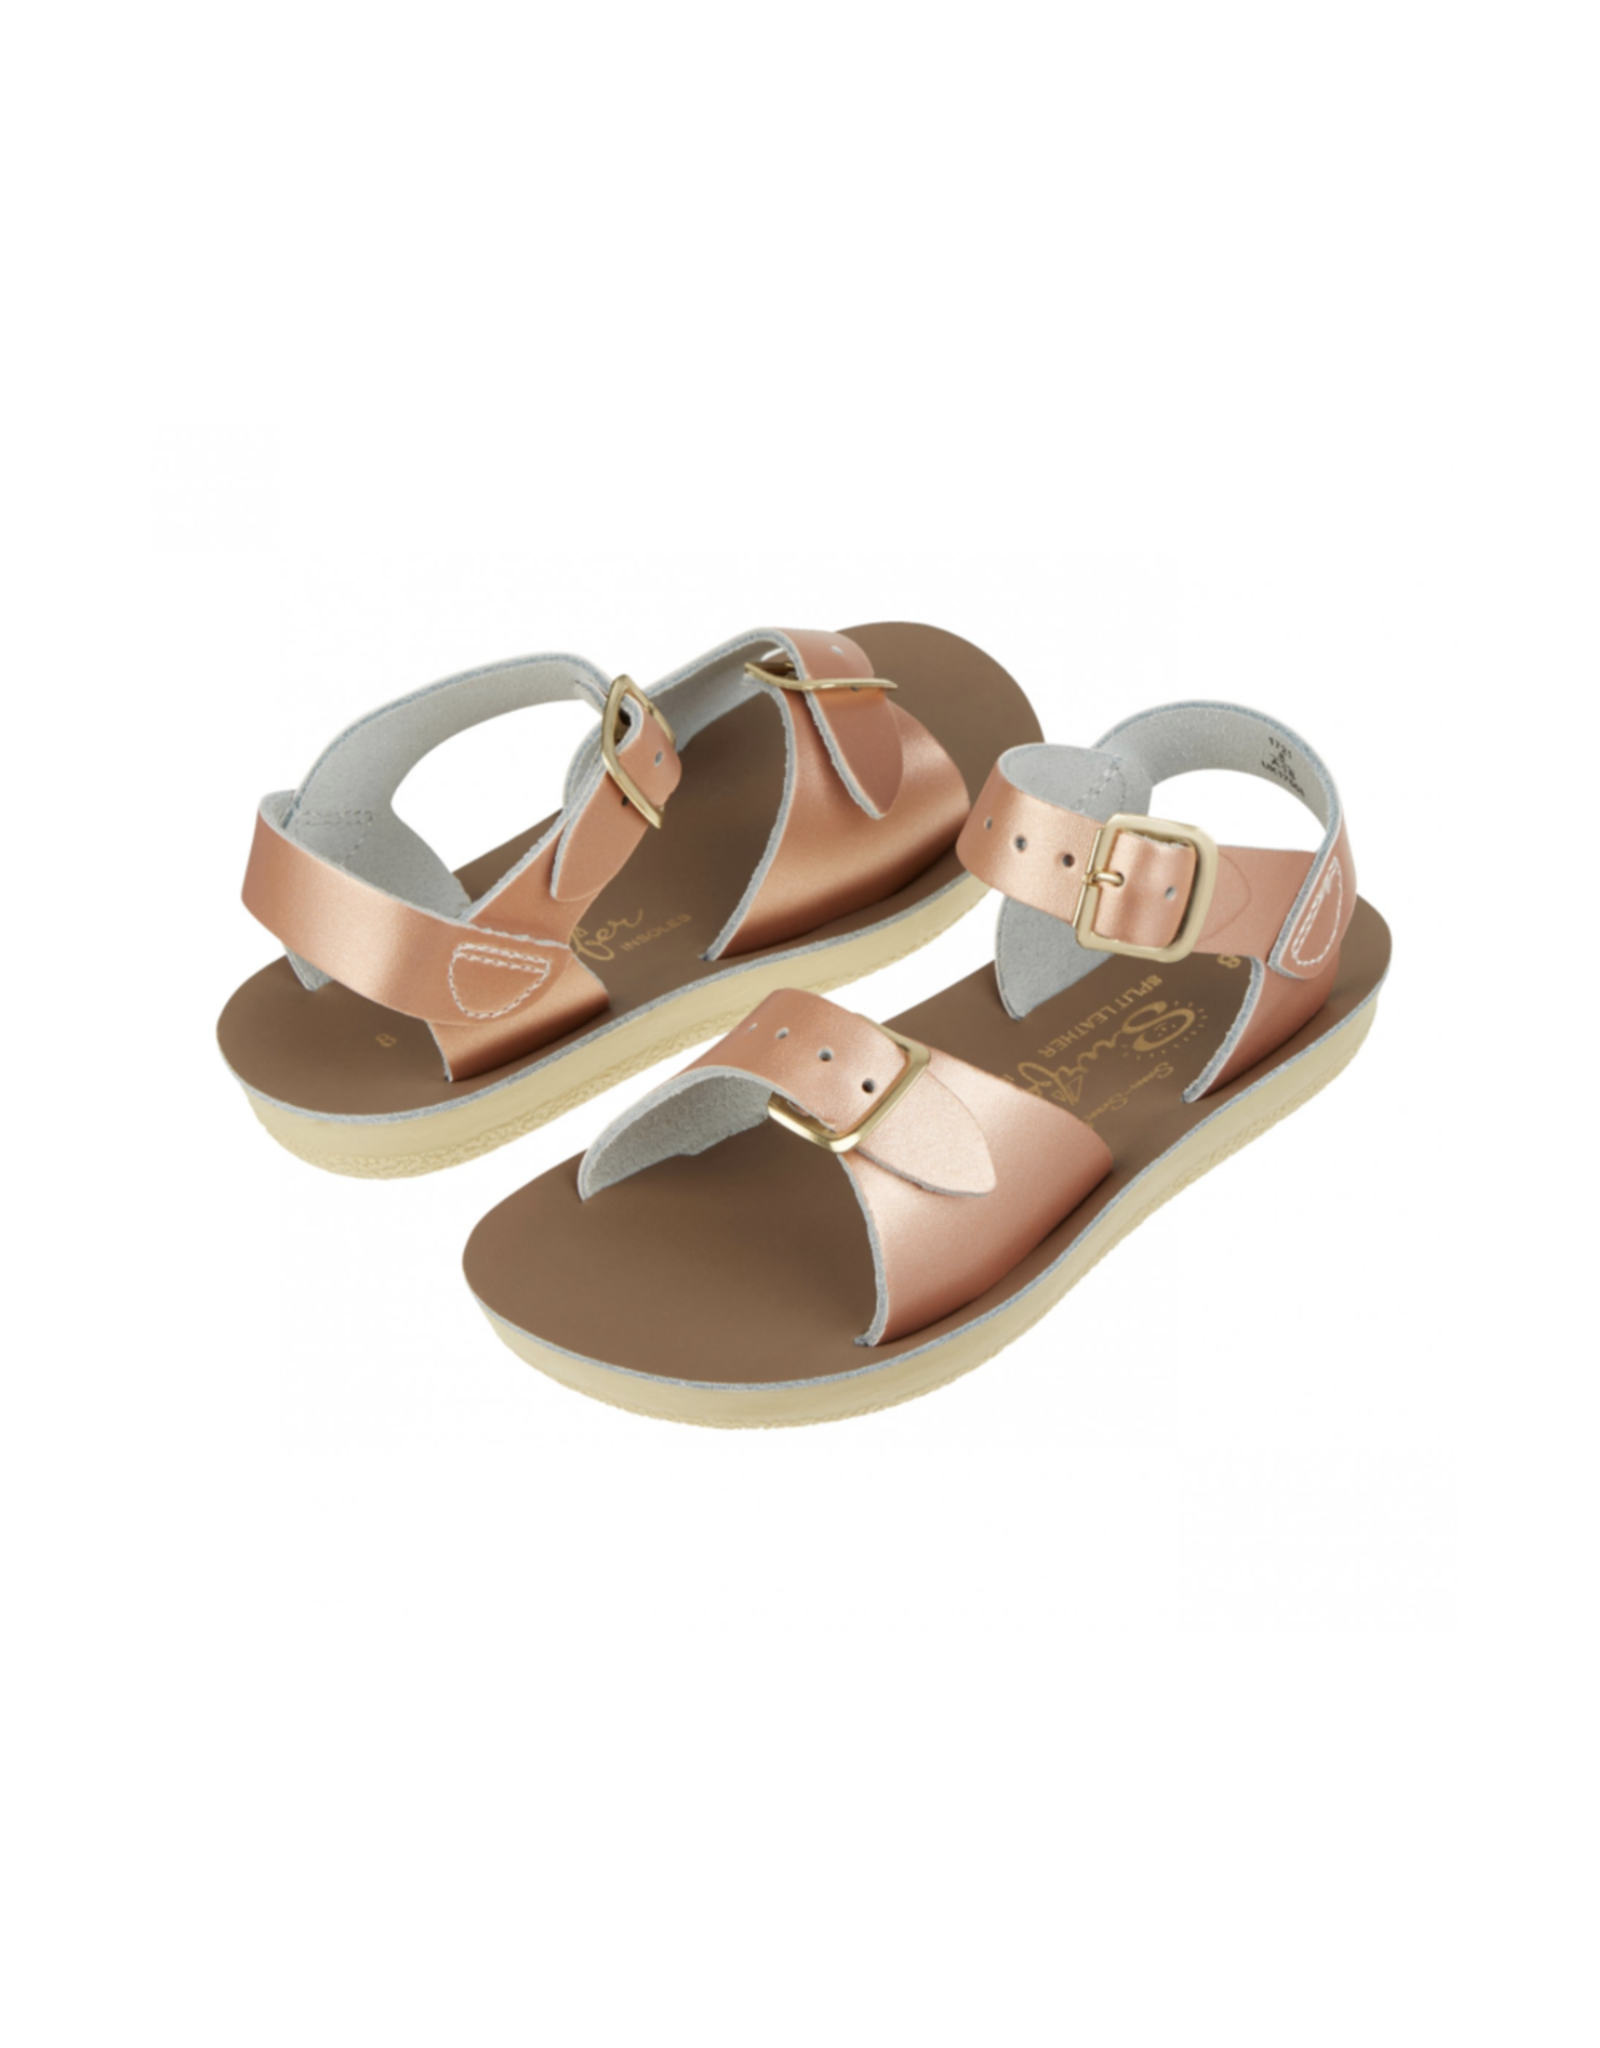 Salt Water Sandals surfer rosé-gold